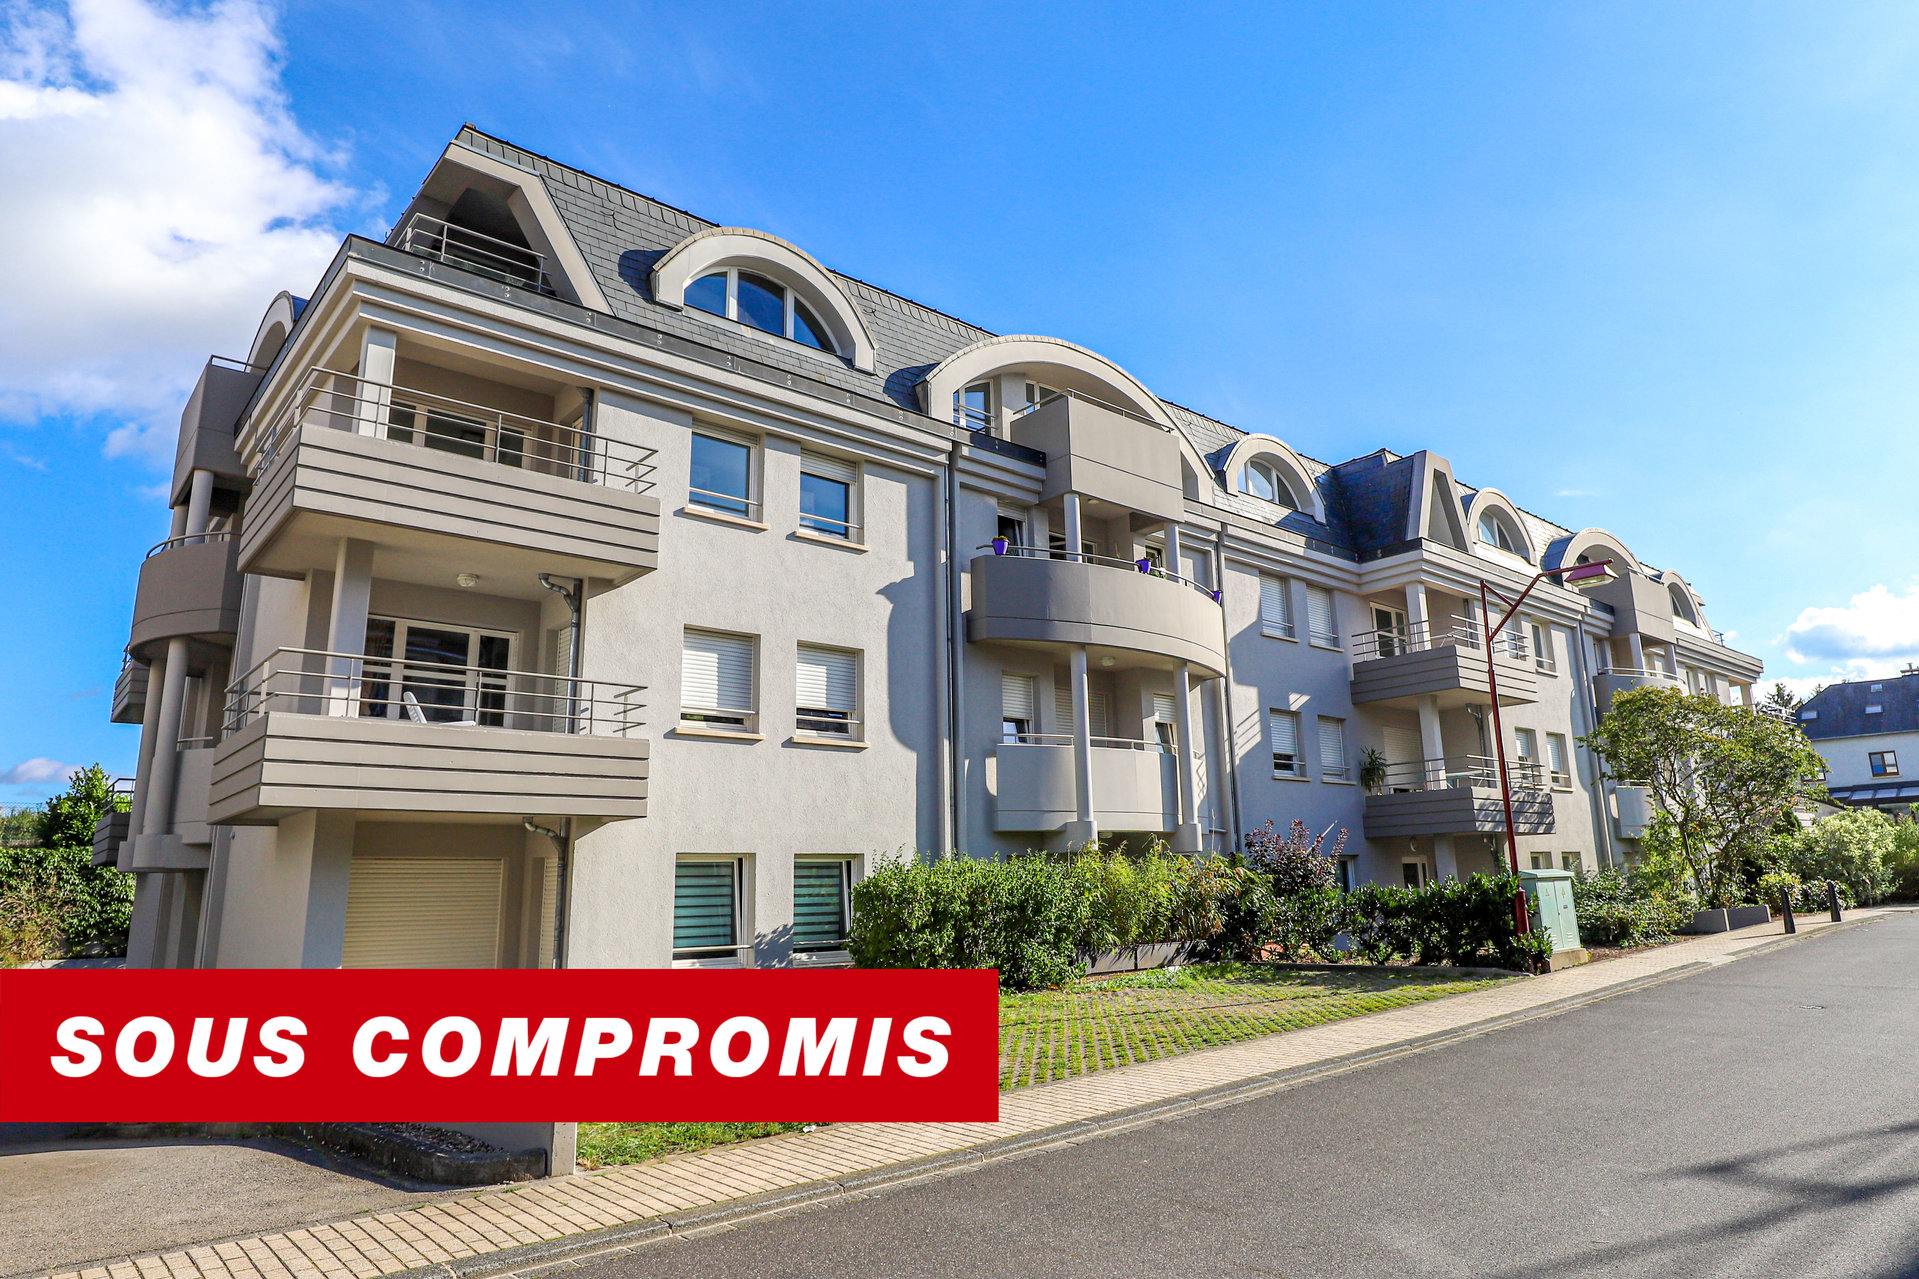 COMPROMIS SIGNE - appartement à 1 chambre à coucher à Roeser